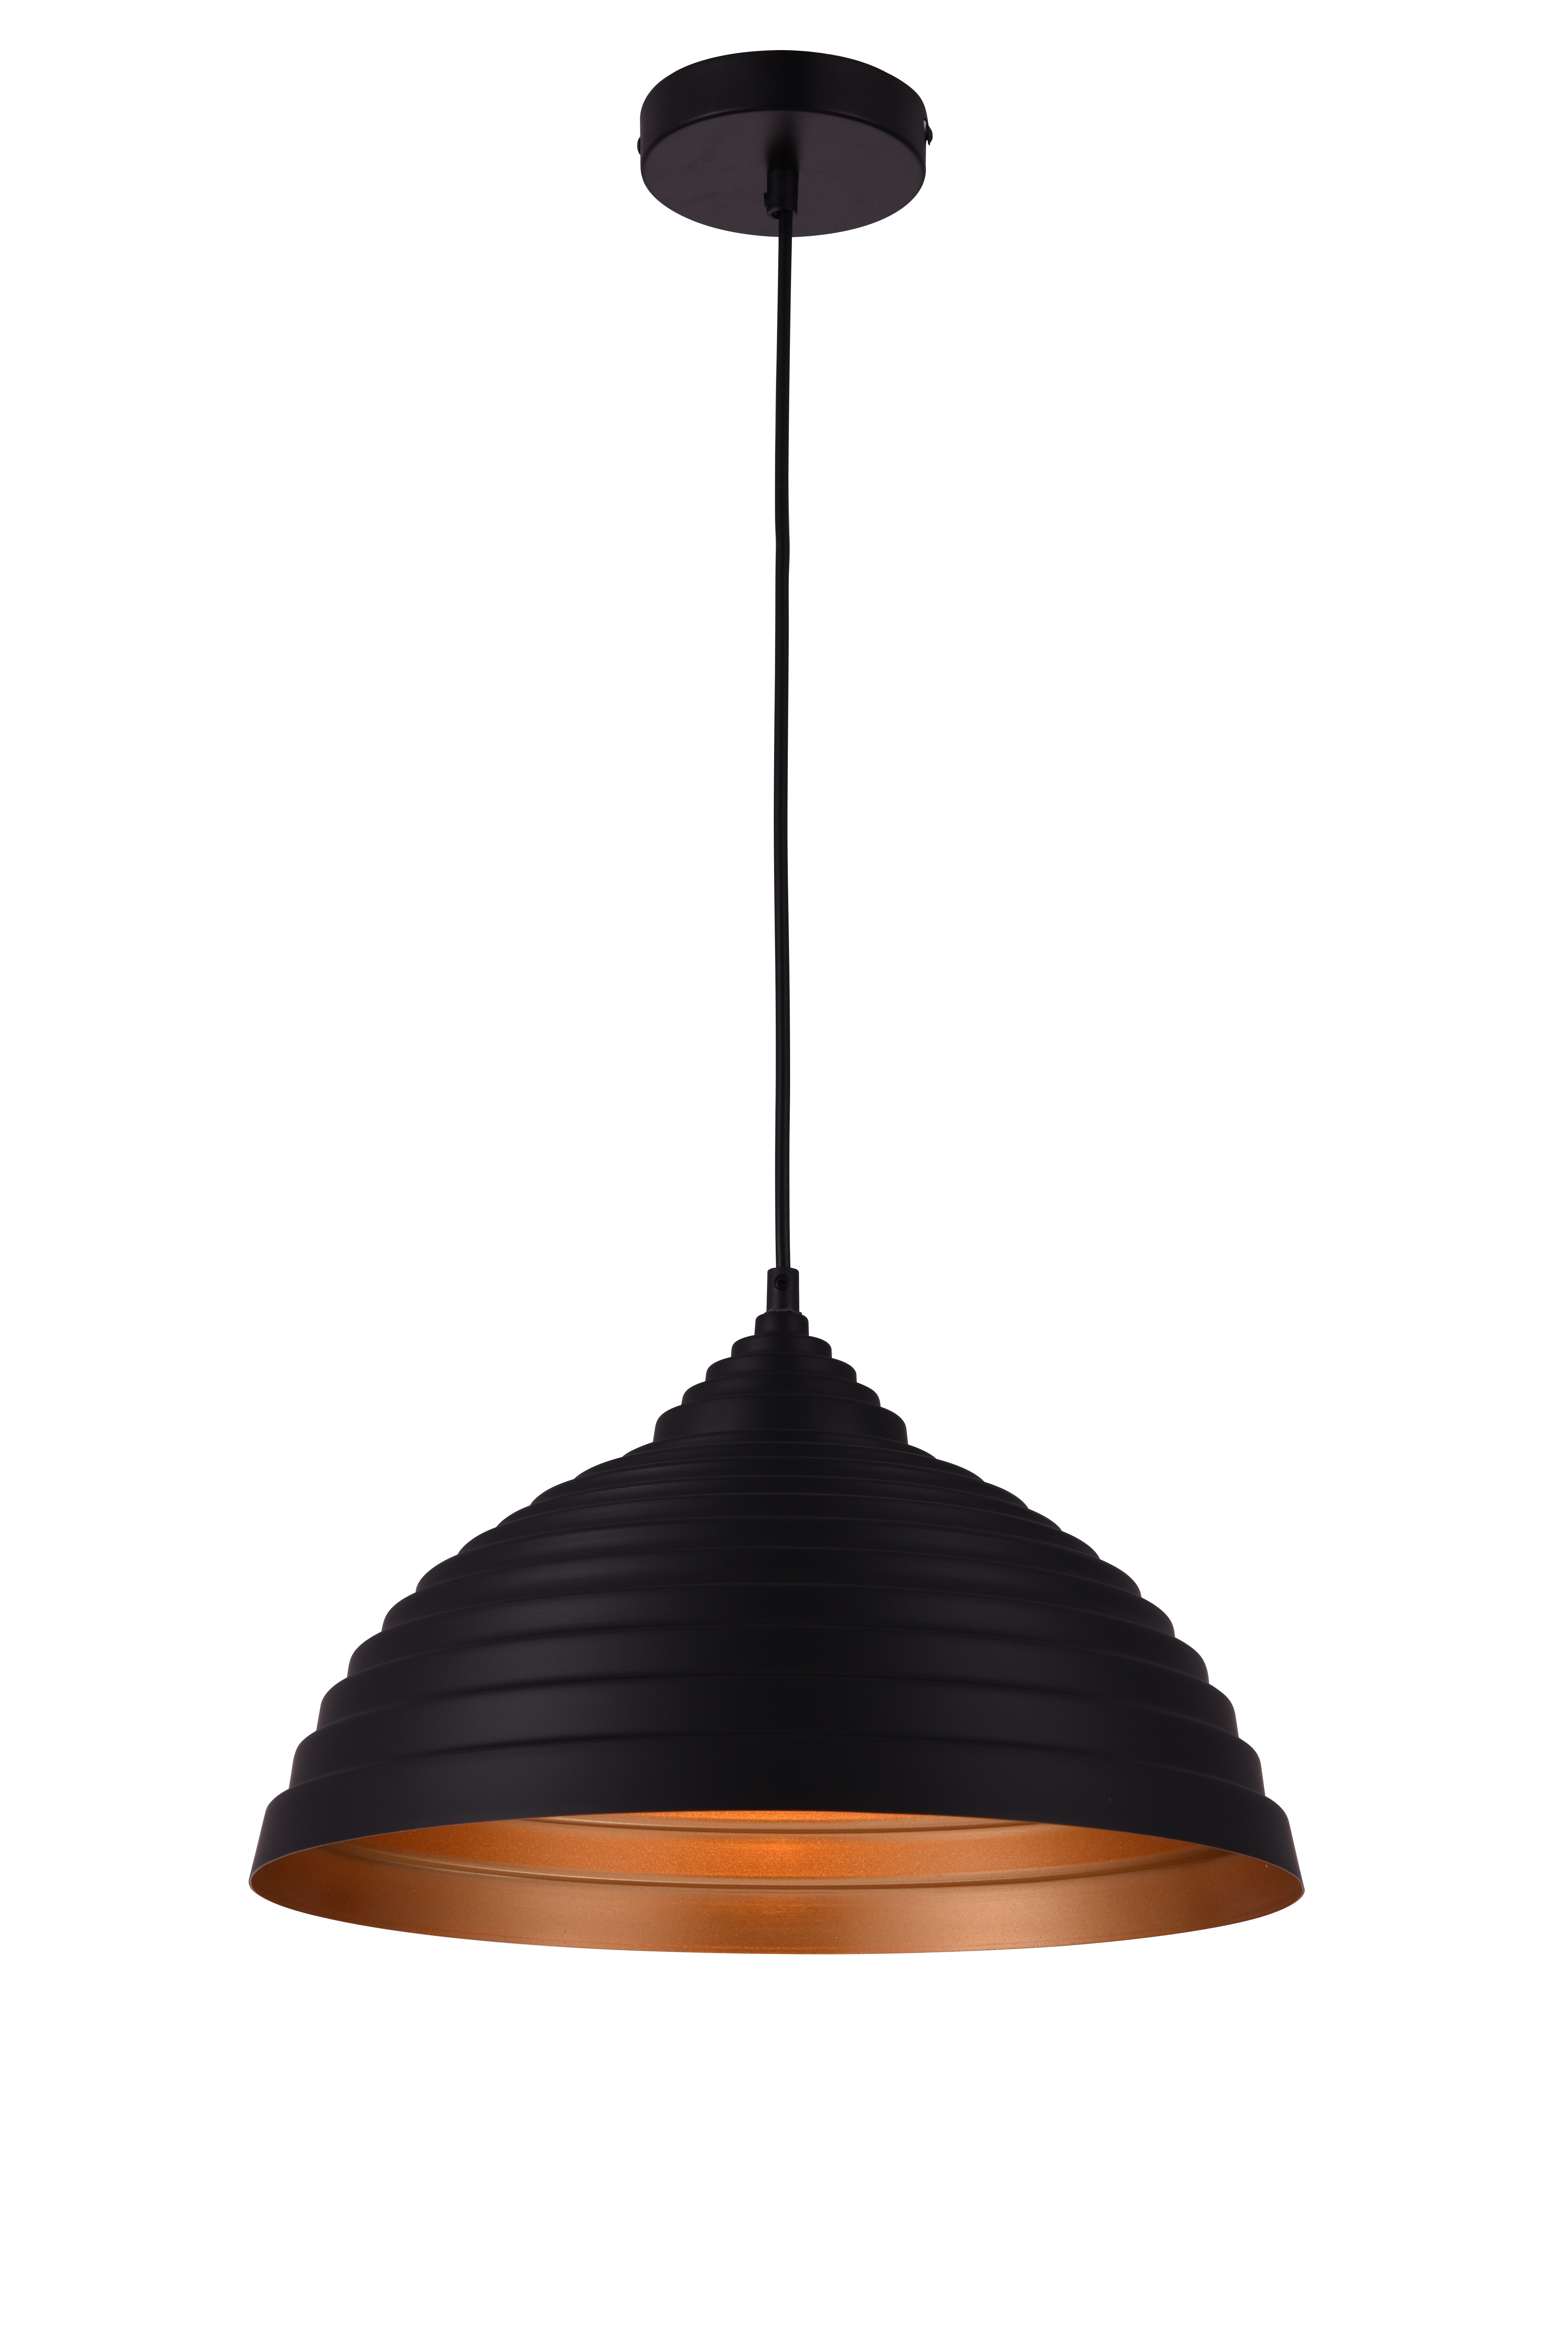 Orren Ellis Siegbald 1 Light Single Dome Pendant Reviews Wayfair